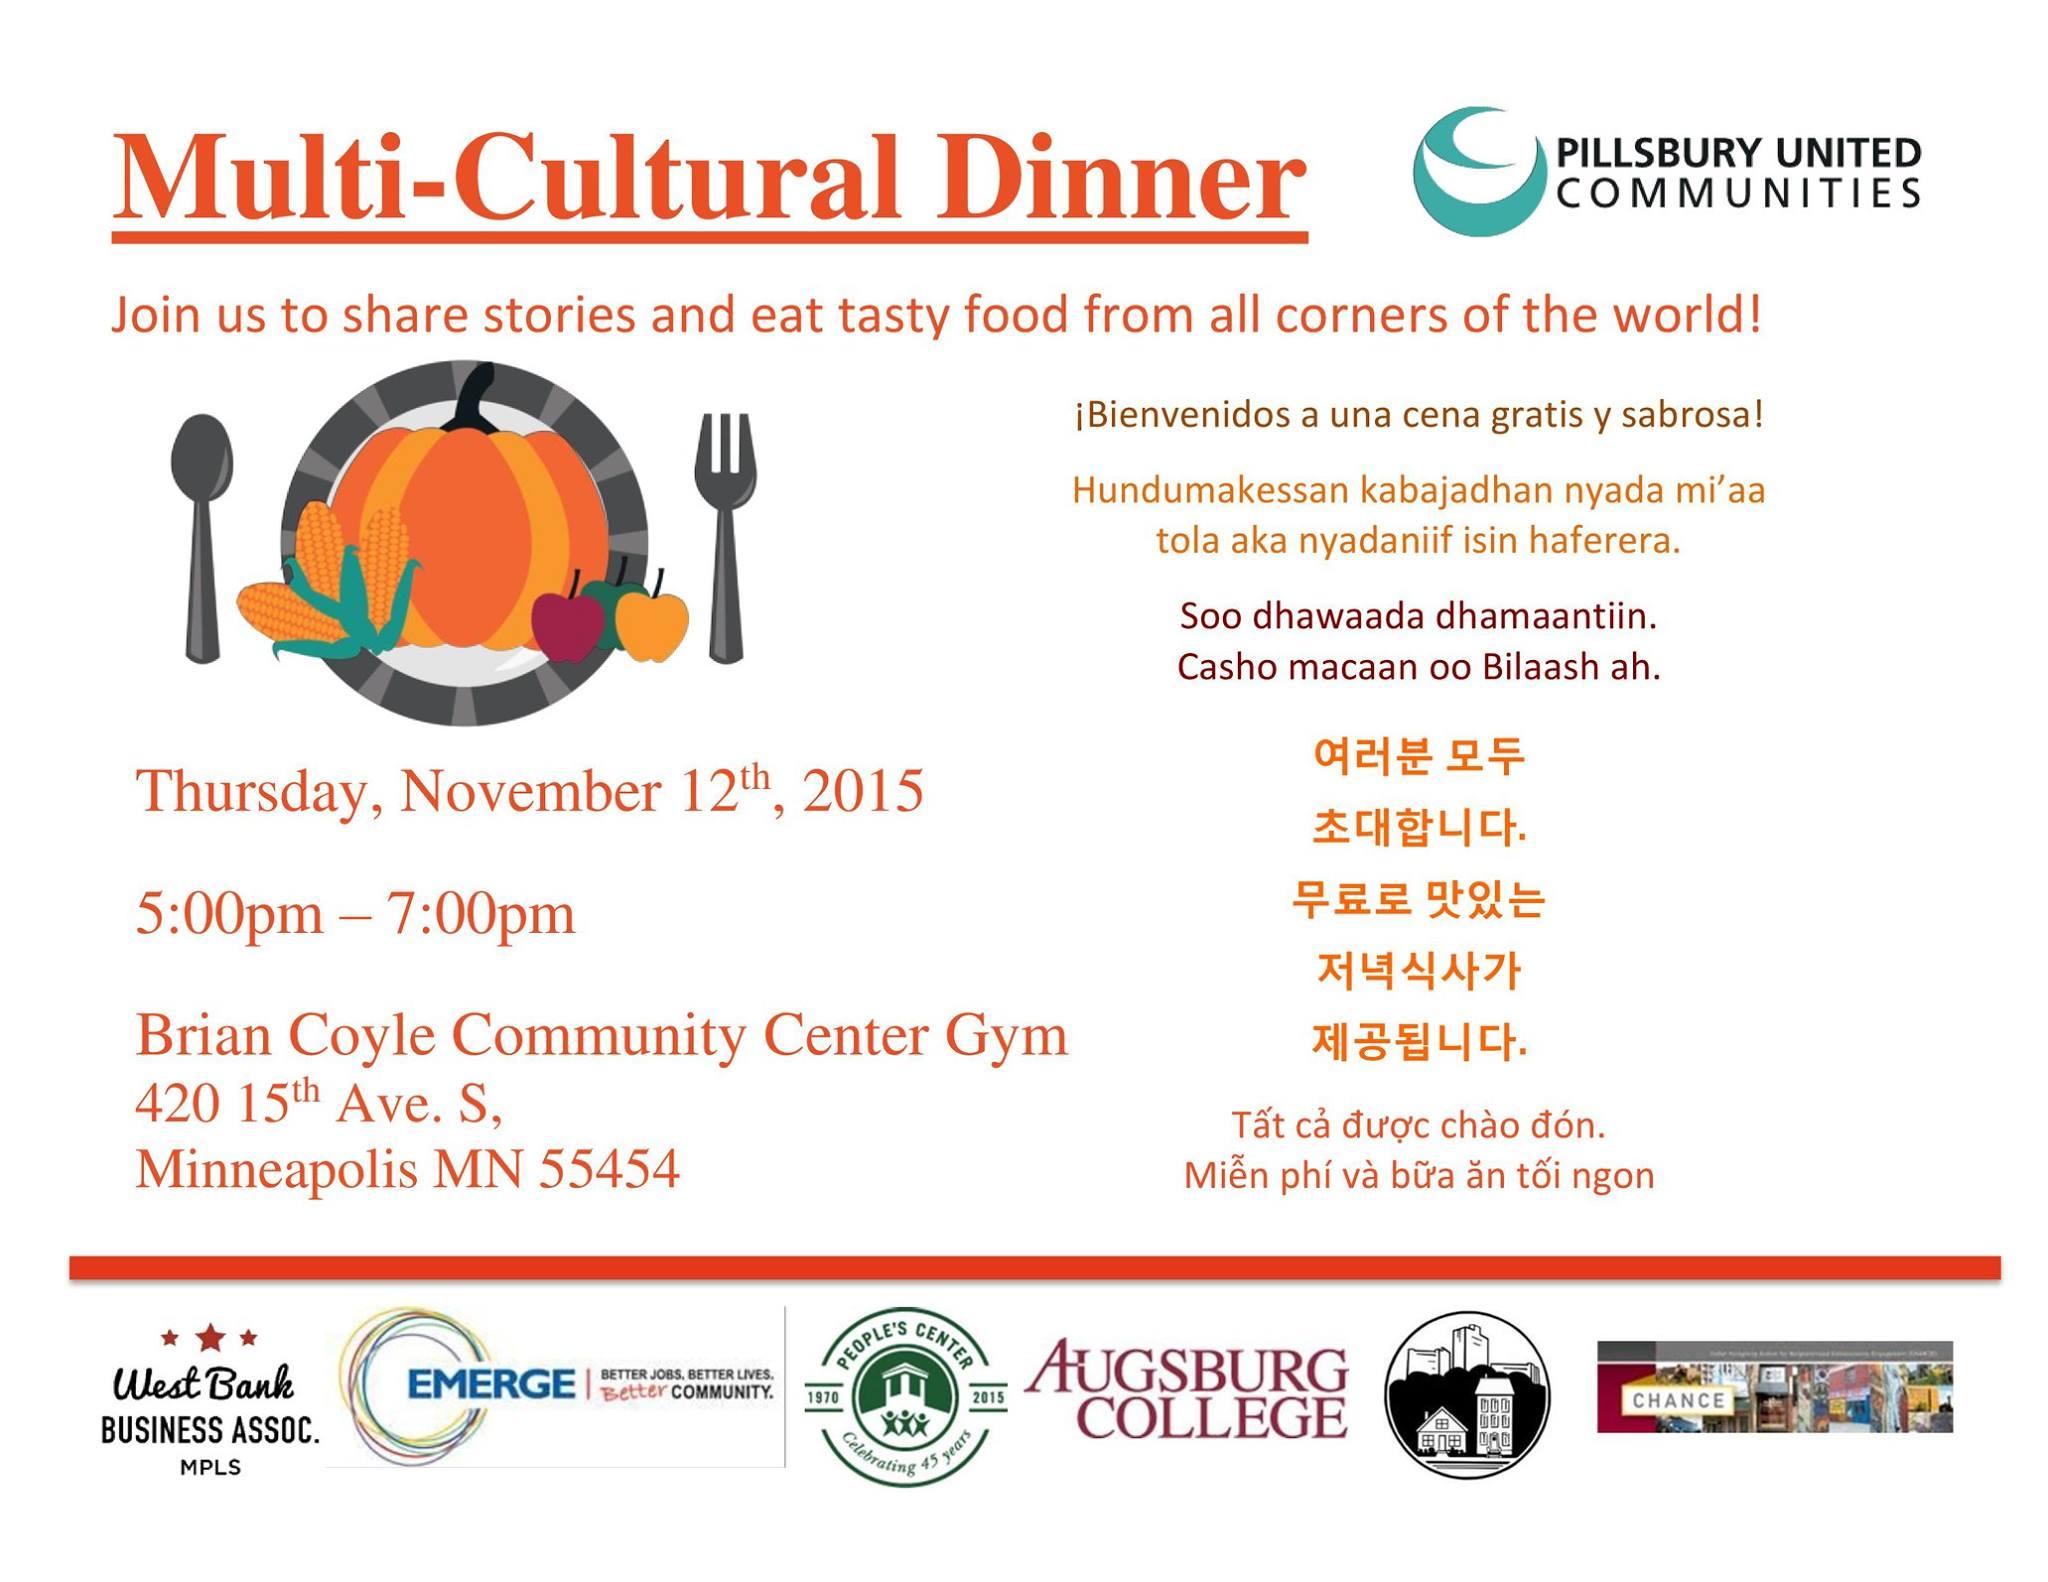 2015 Multi-Cultural Dinner